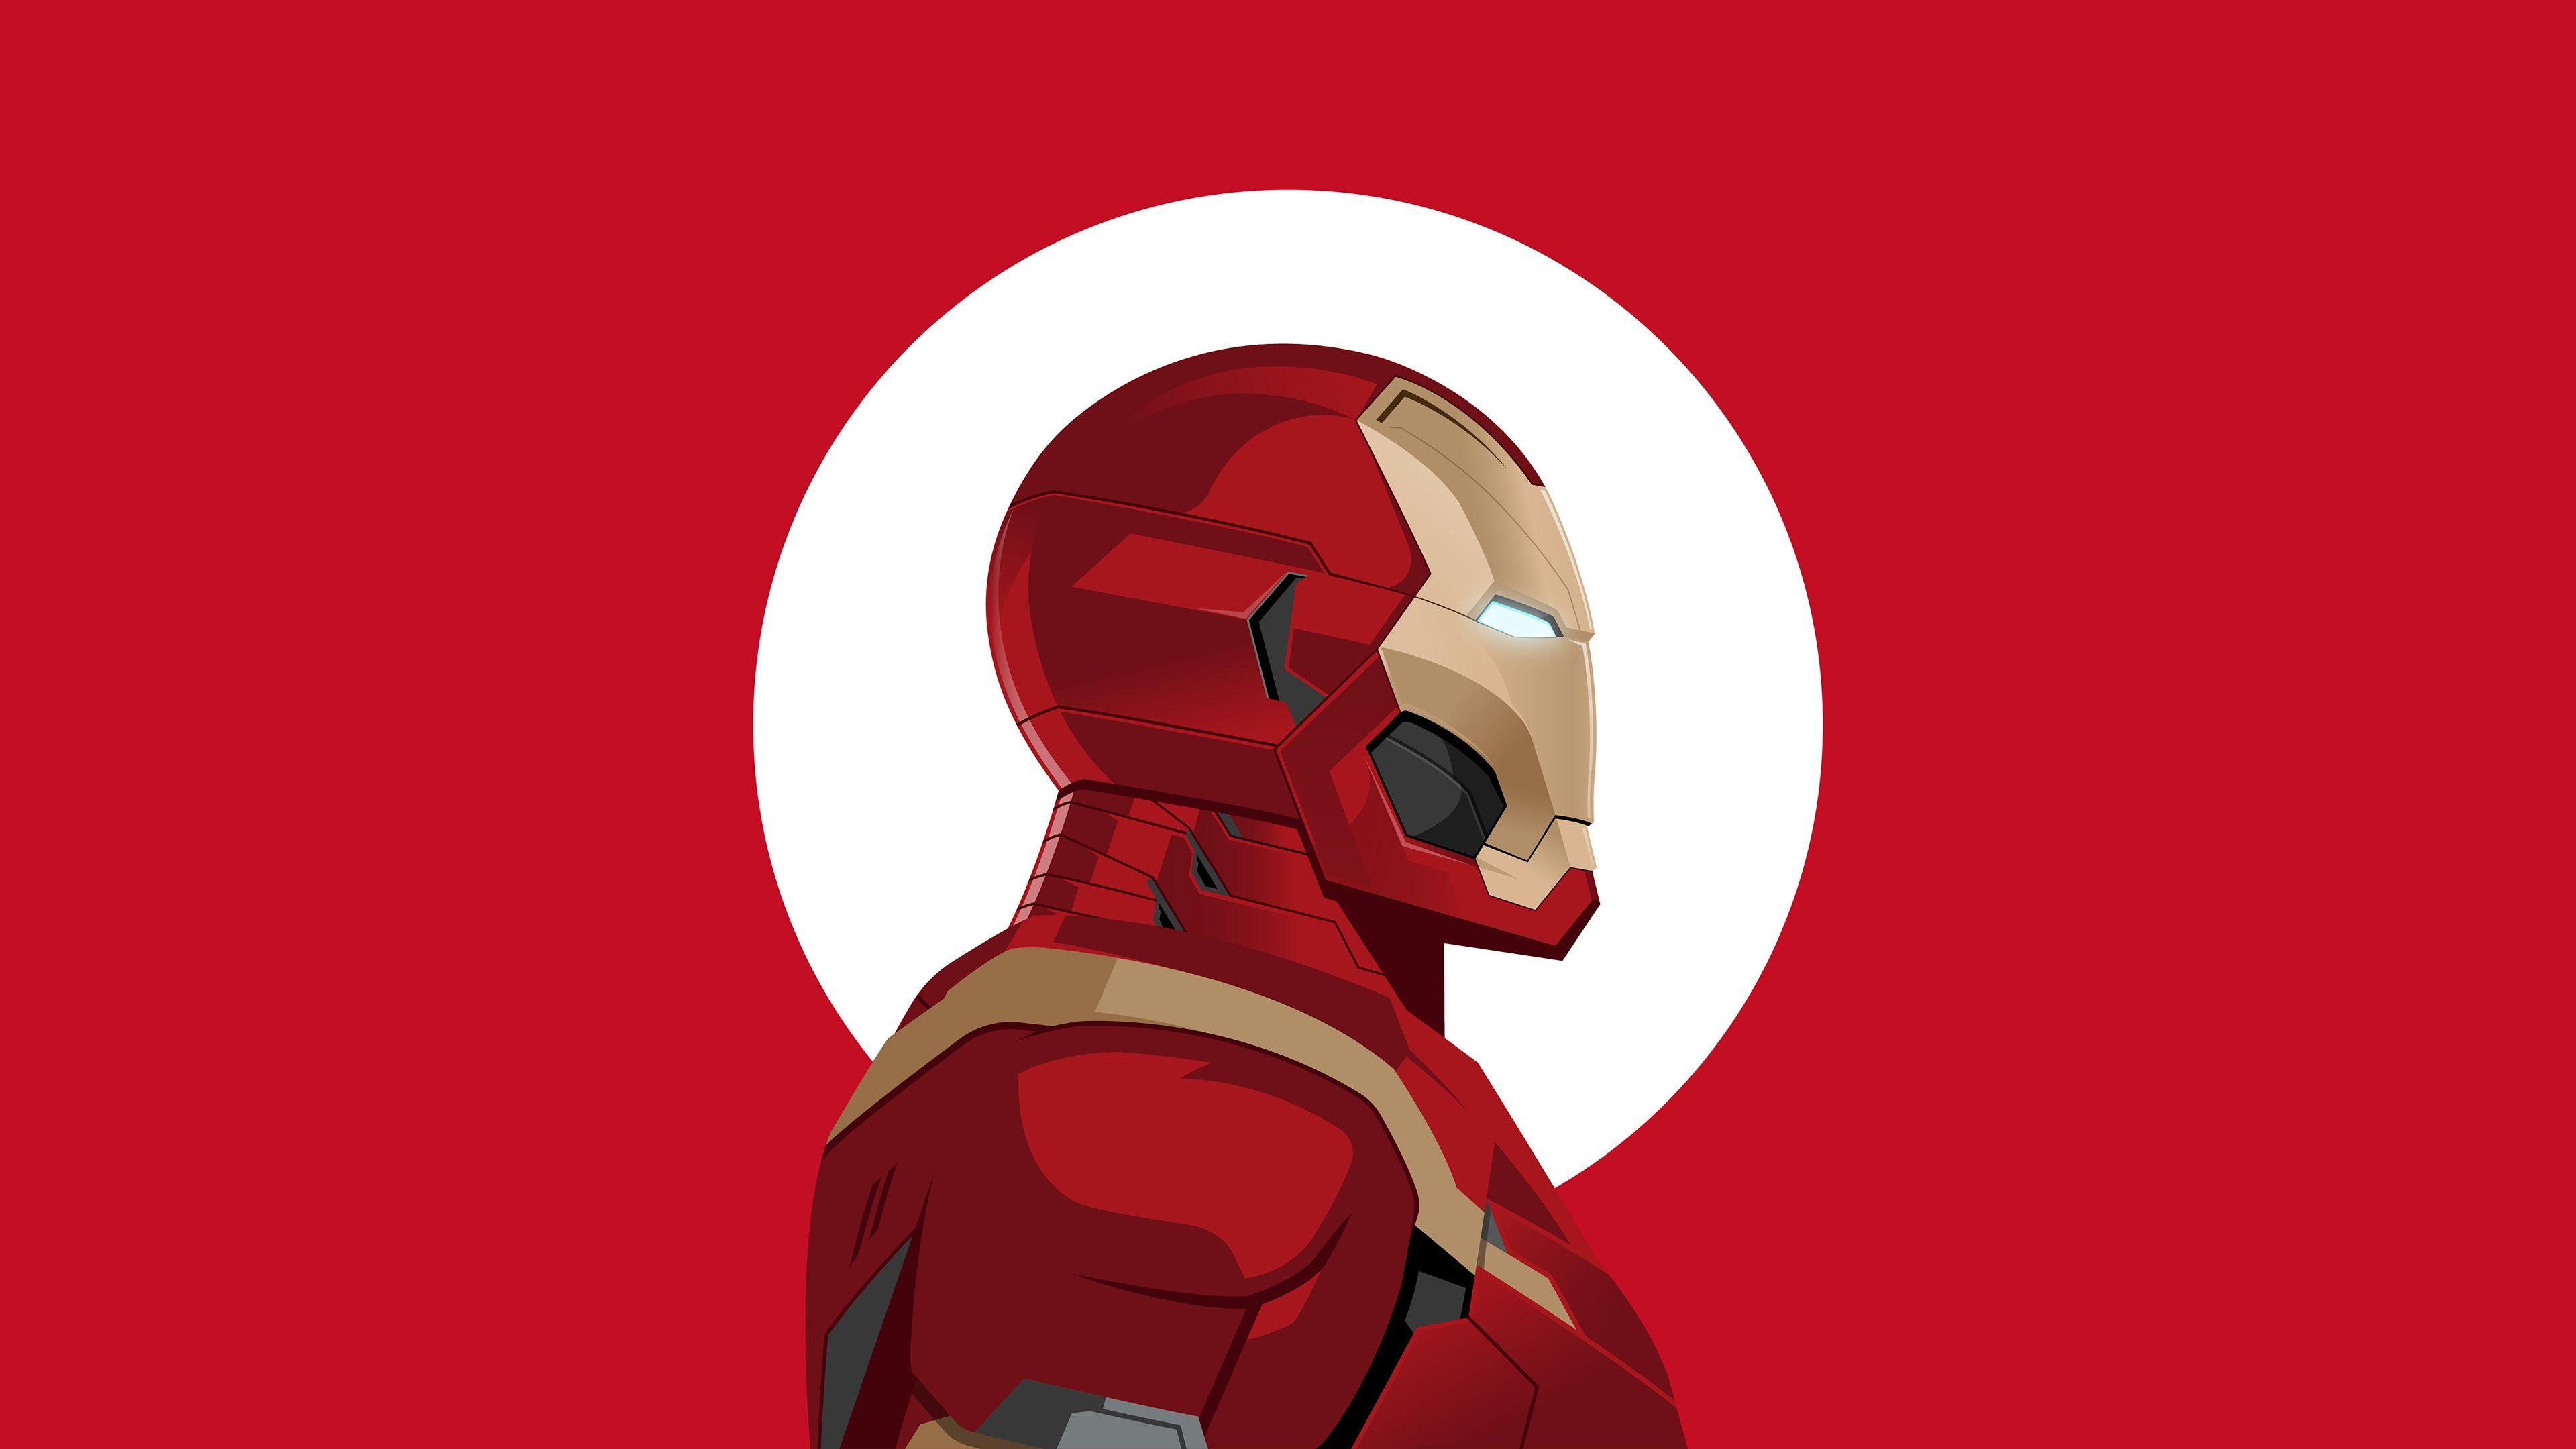 Wallpaper 4k Iron Man Minimal 4k 4k-wallpapers, artist ...